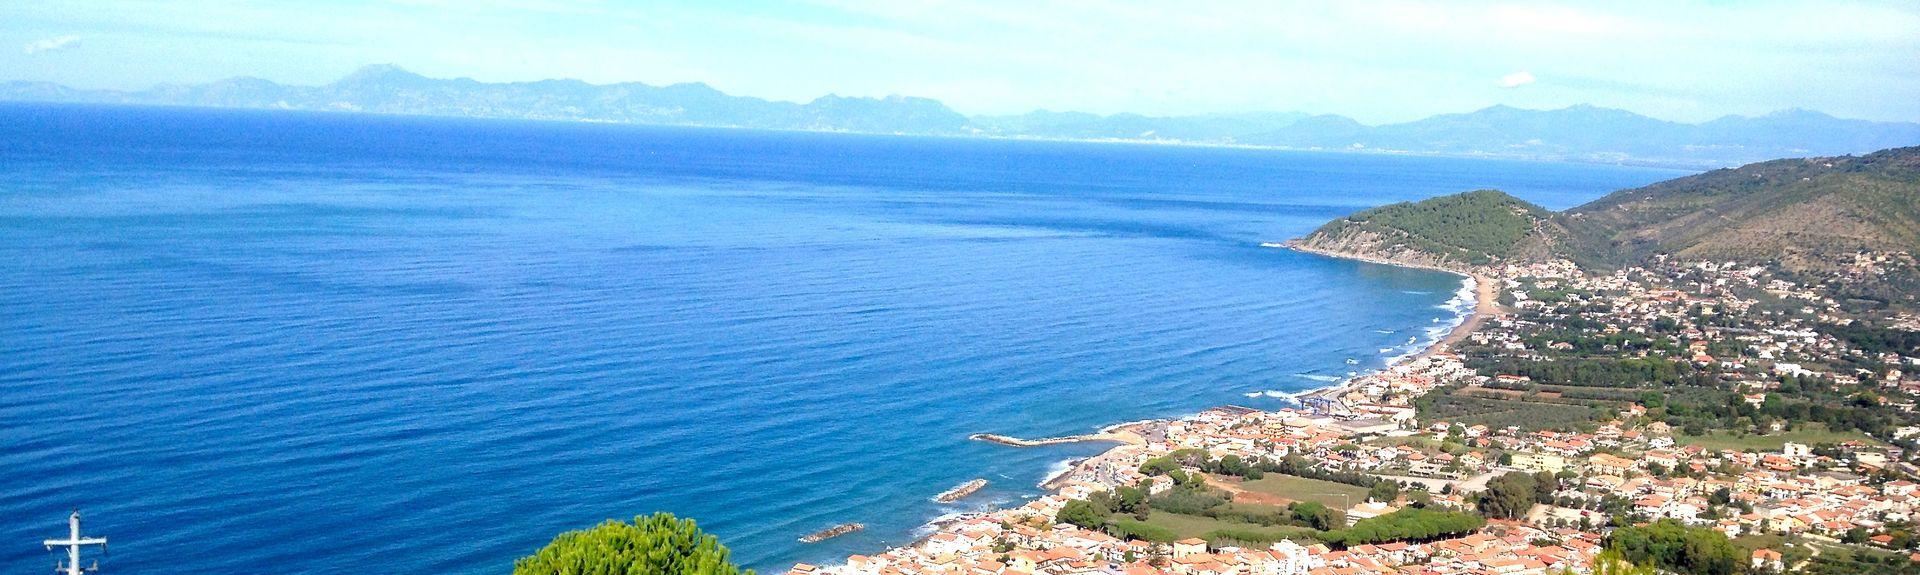 Giungano, Campania, Italië